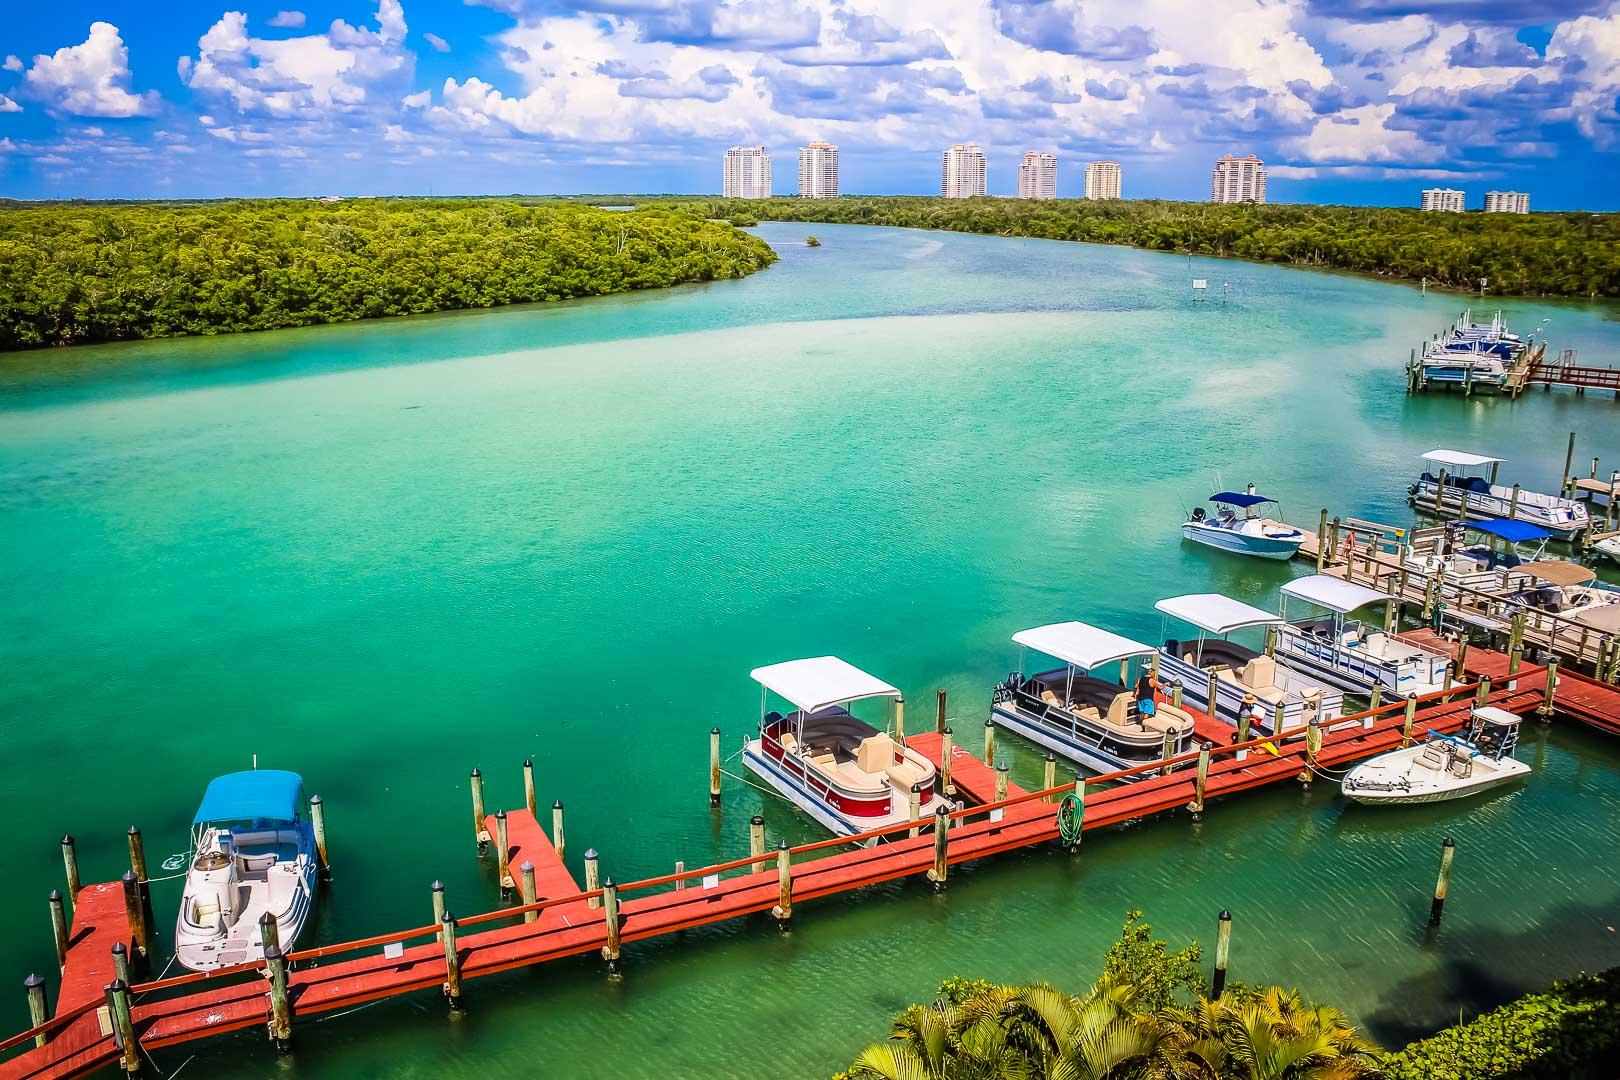 A scenic view of the boat dock at VRI's Bonita Resort and Club in Florida.